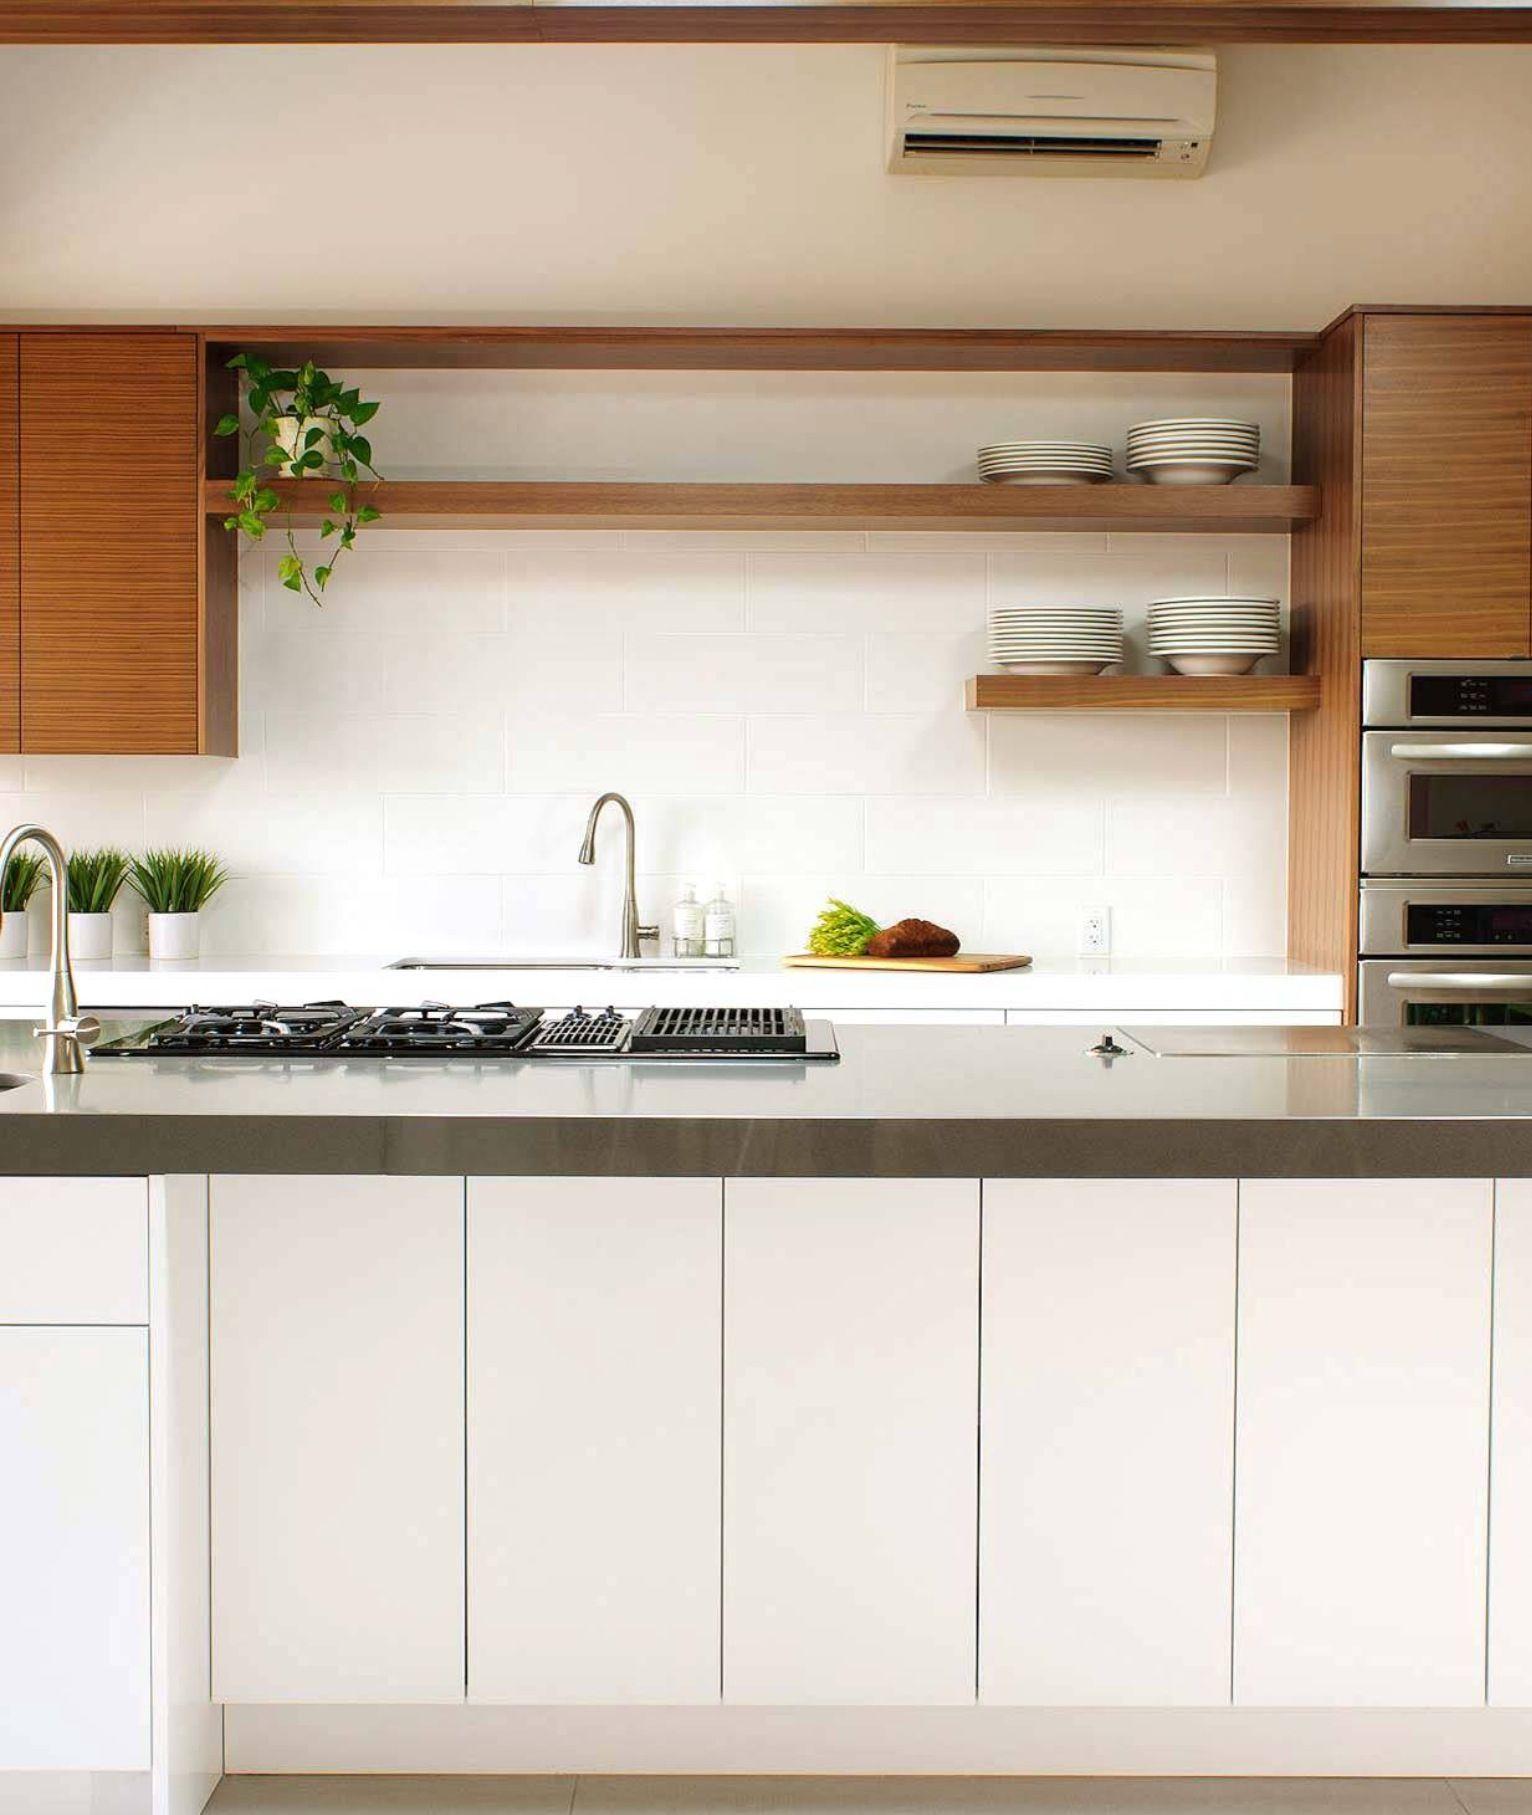 Kitchen Design Ideas and Inspiration  Kitchen Design Ideas  Pintere ...